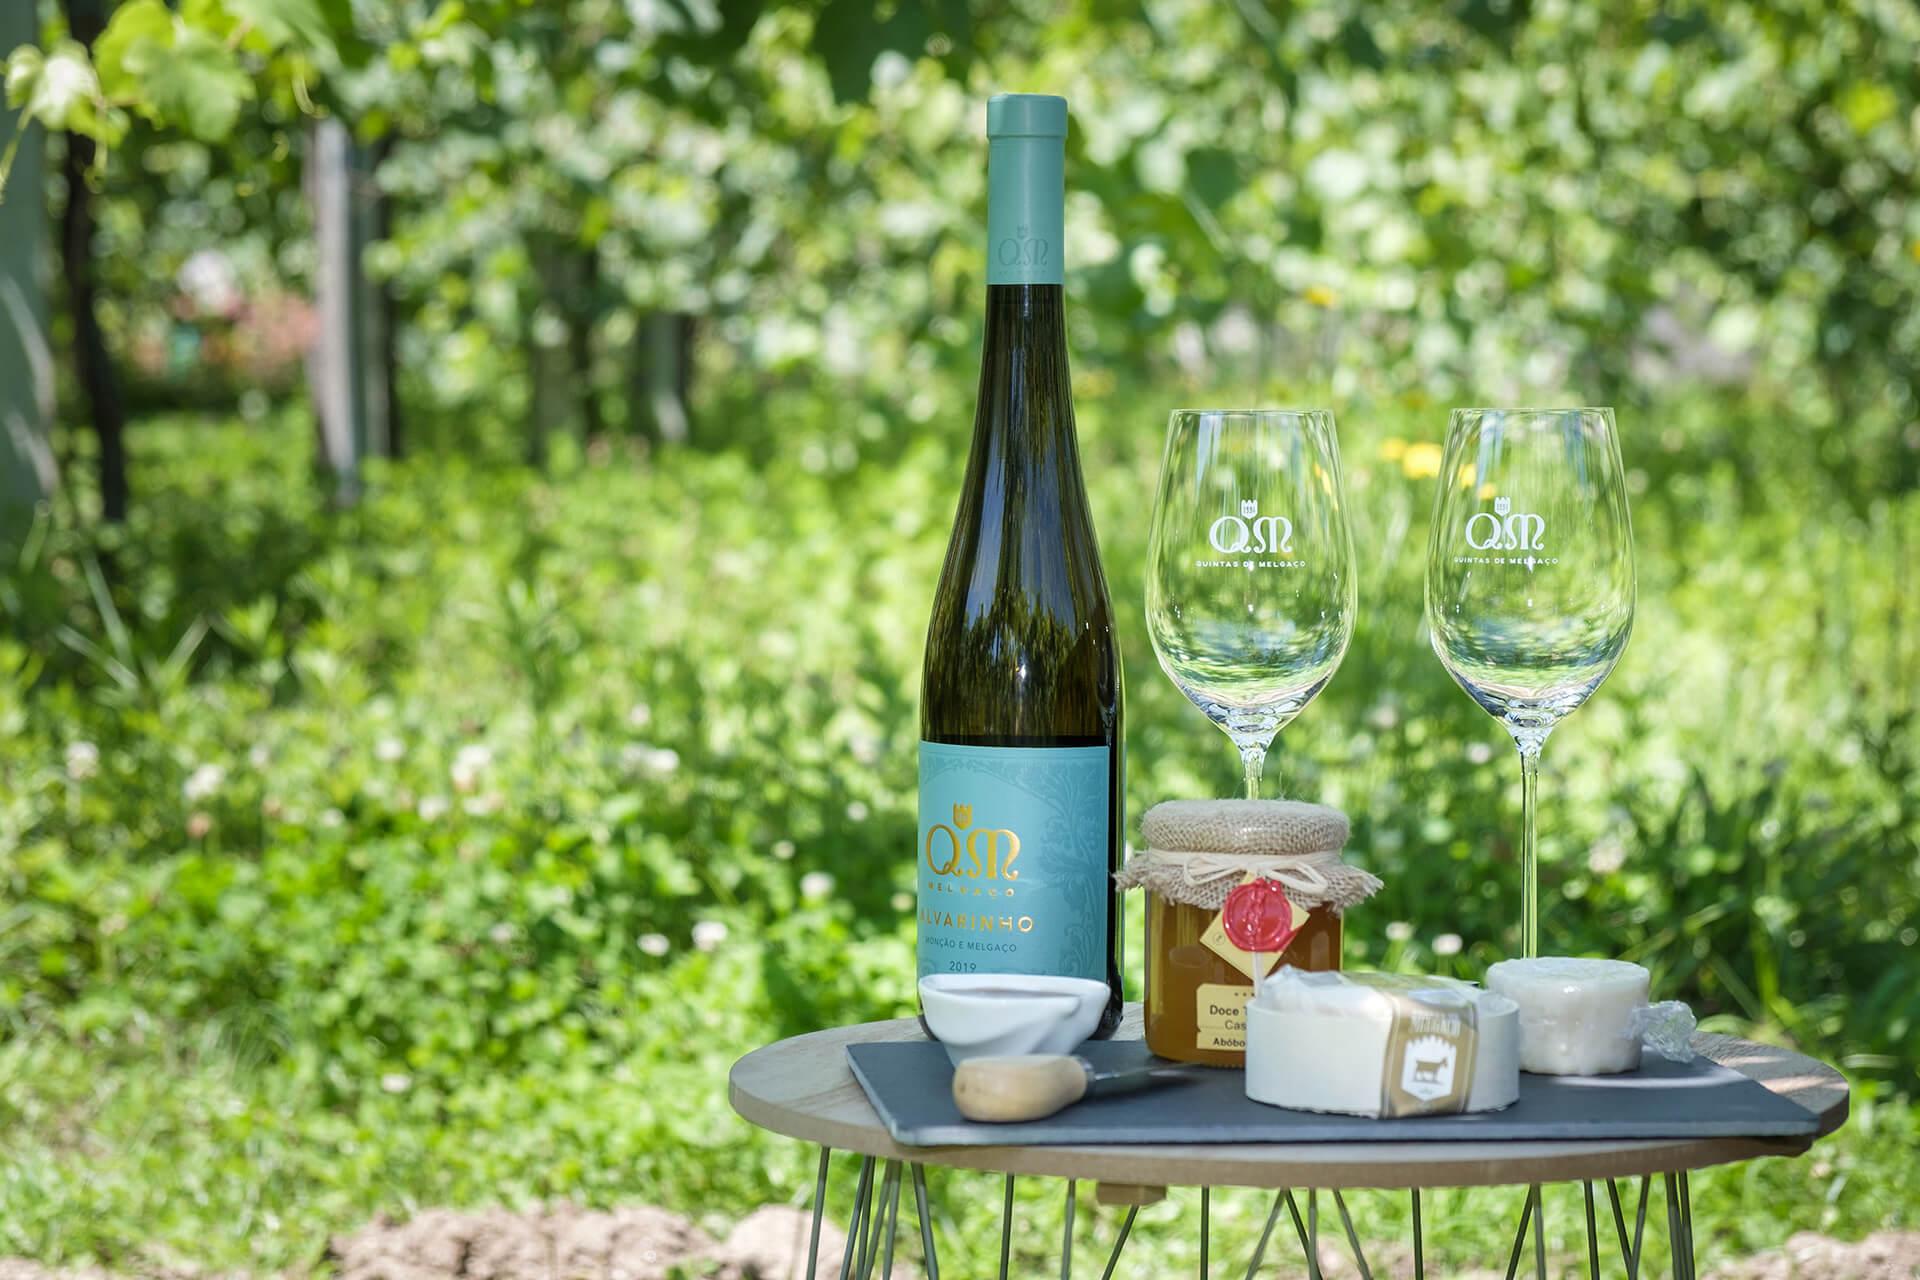 Quintas de Melgaço - Visita & Prova Flavours